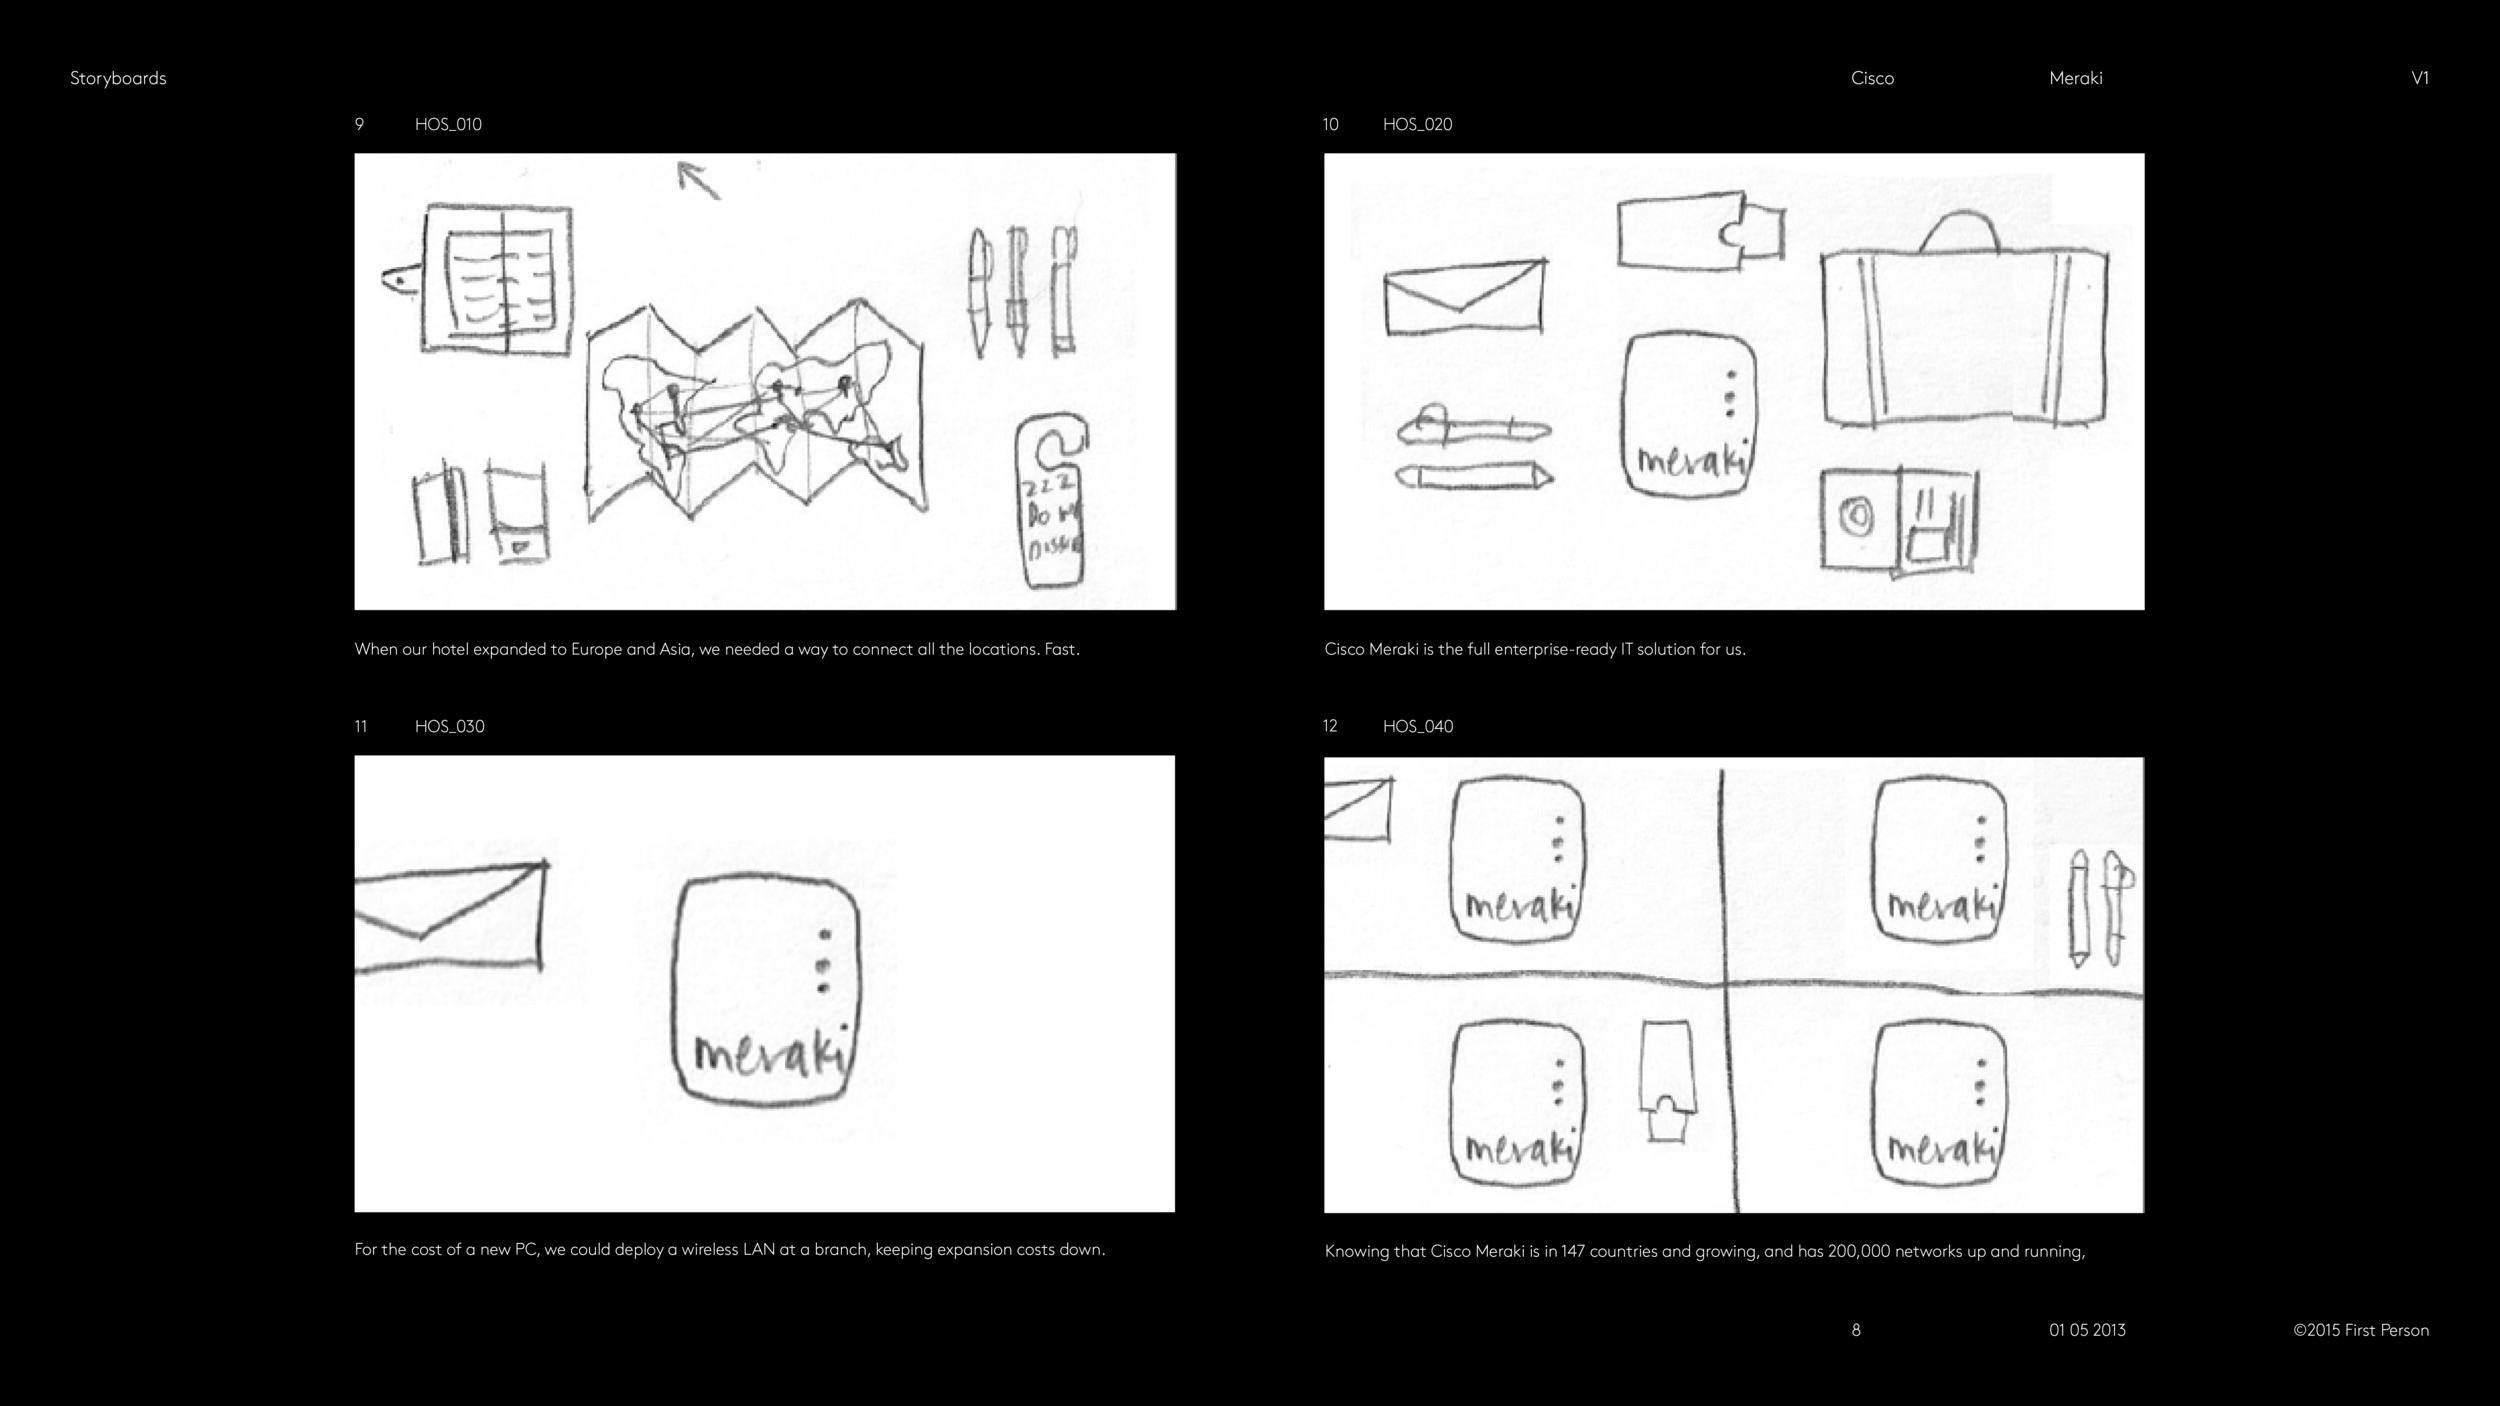 3431_CiscoMeraki_Storyboards_v01-8.png